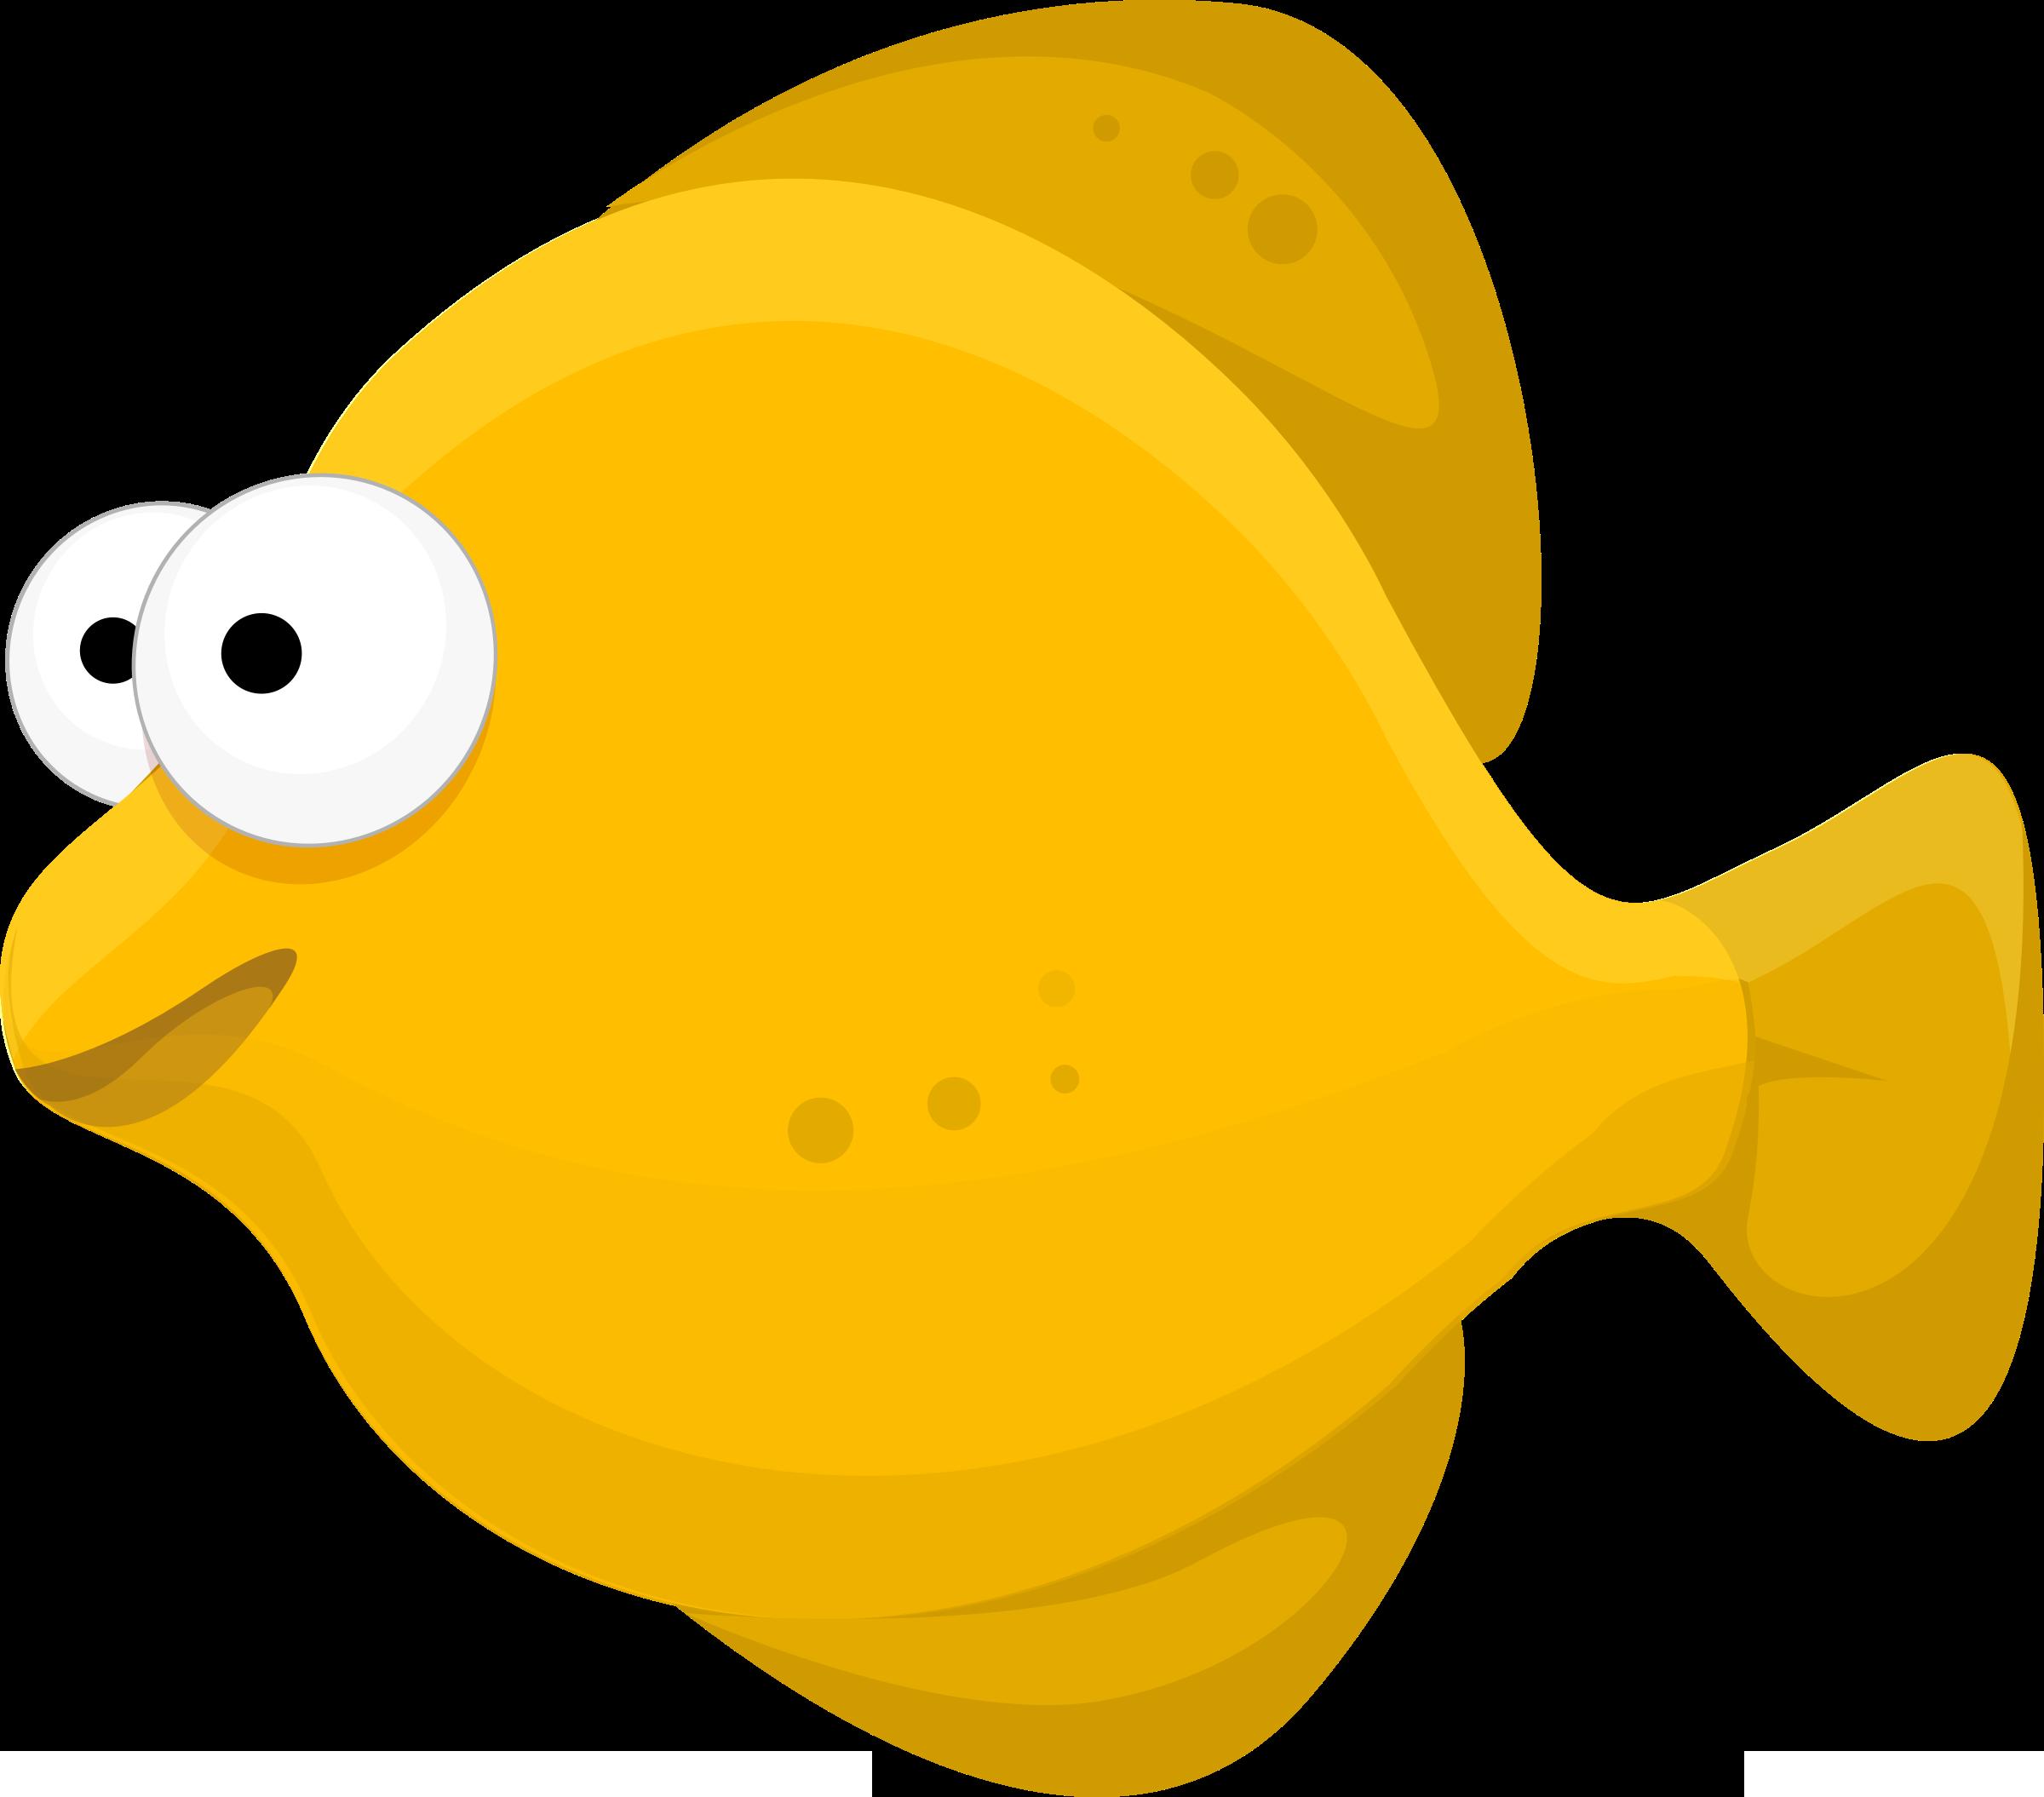 Artwork Vector Fish Cartoon Images Png Cartoon Ankaperla Com Yellow Fish Fish Cartoon Images Cartoons Vector